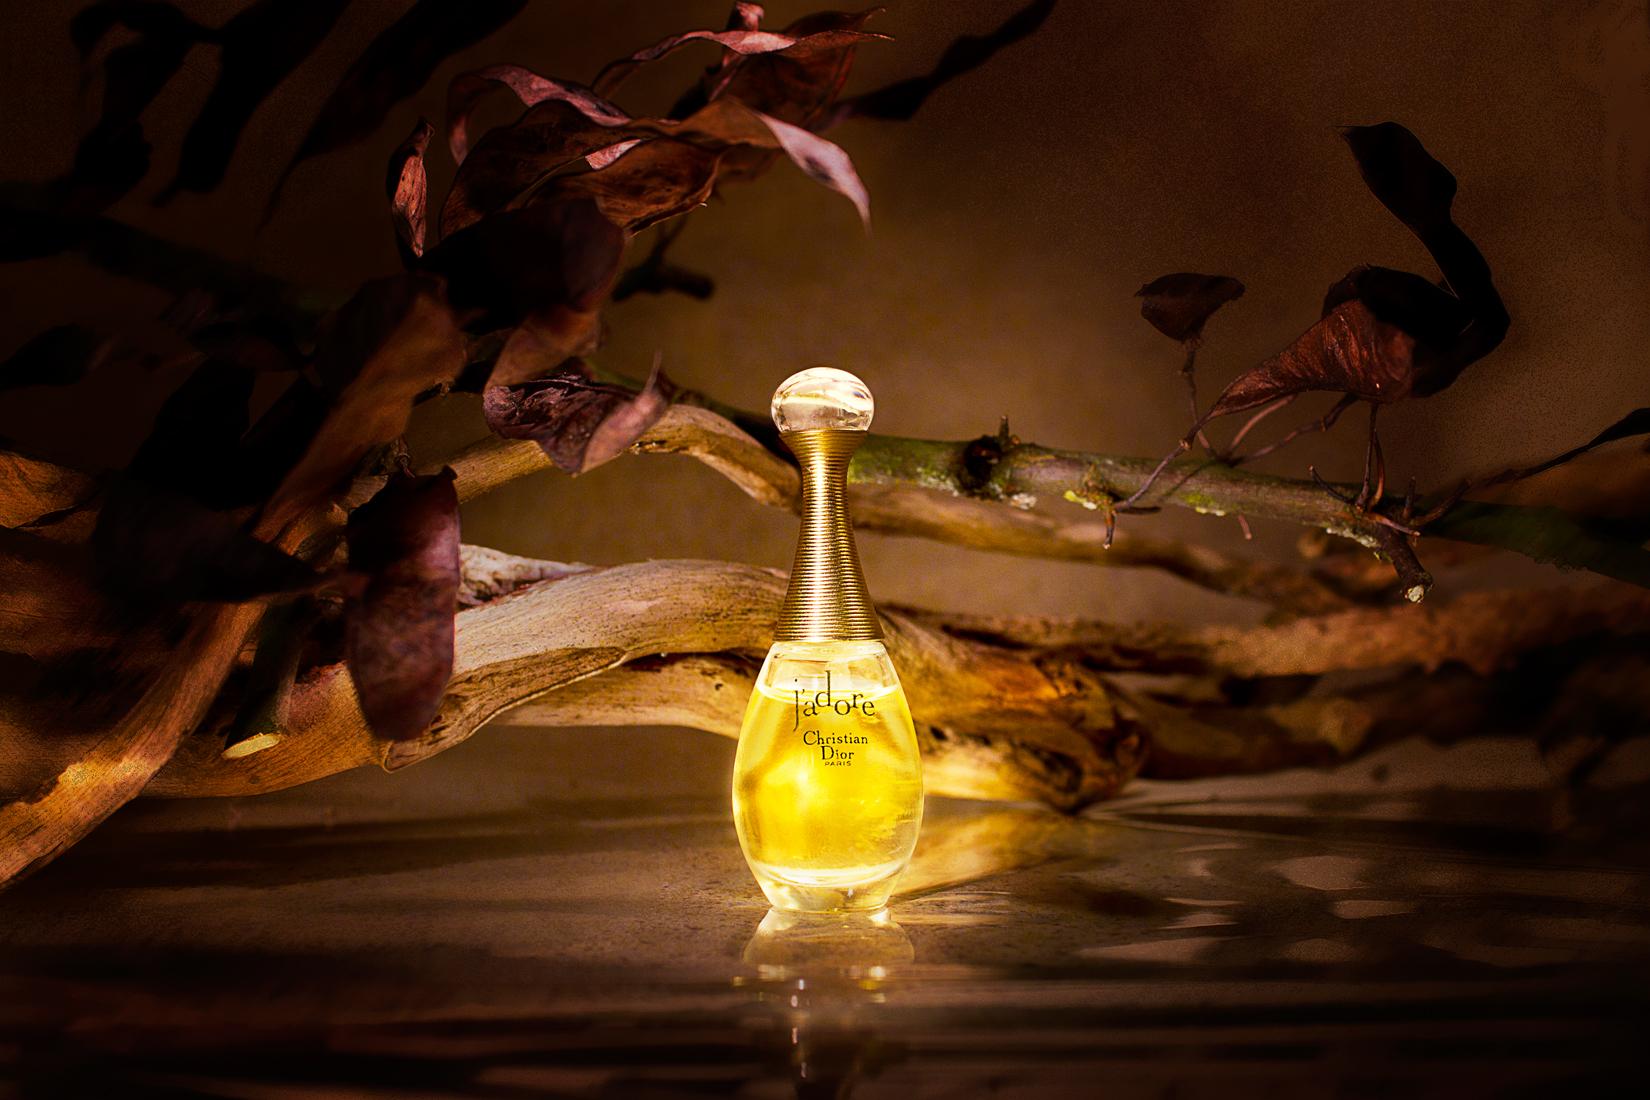 parfum_jadore_dior